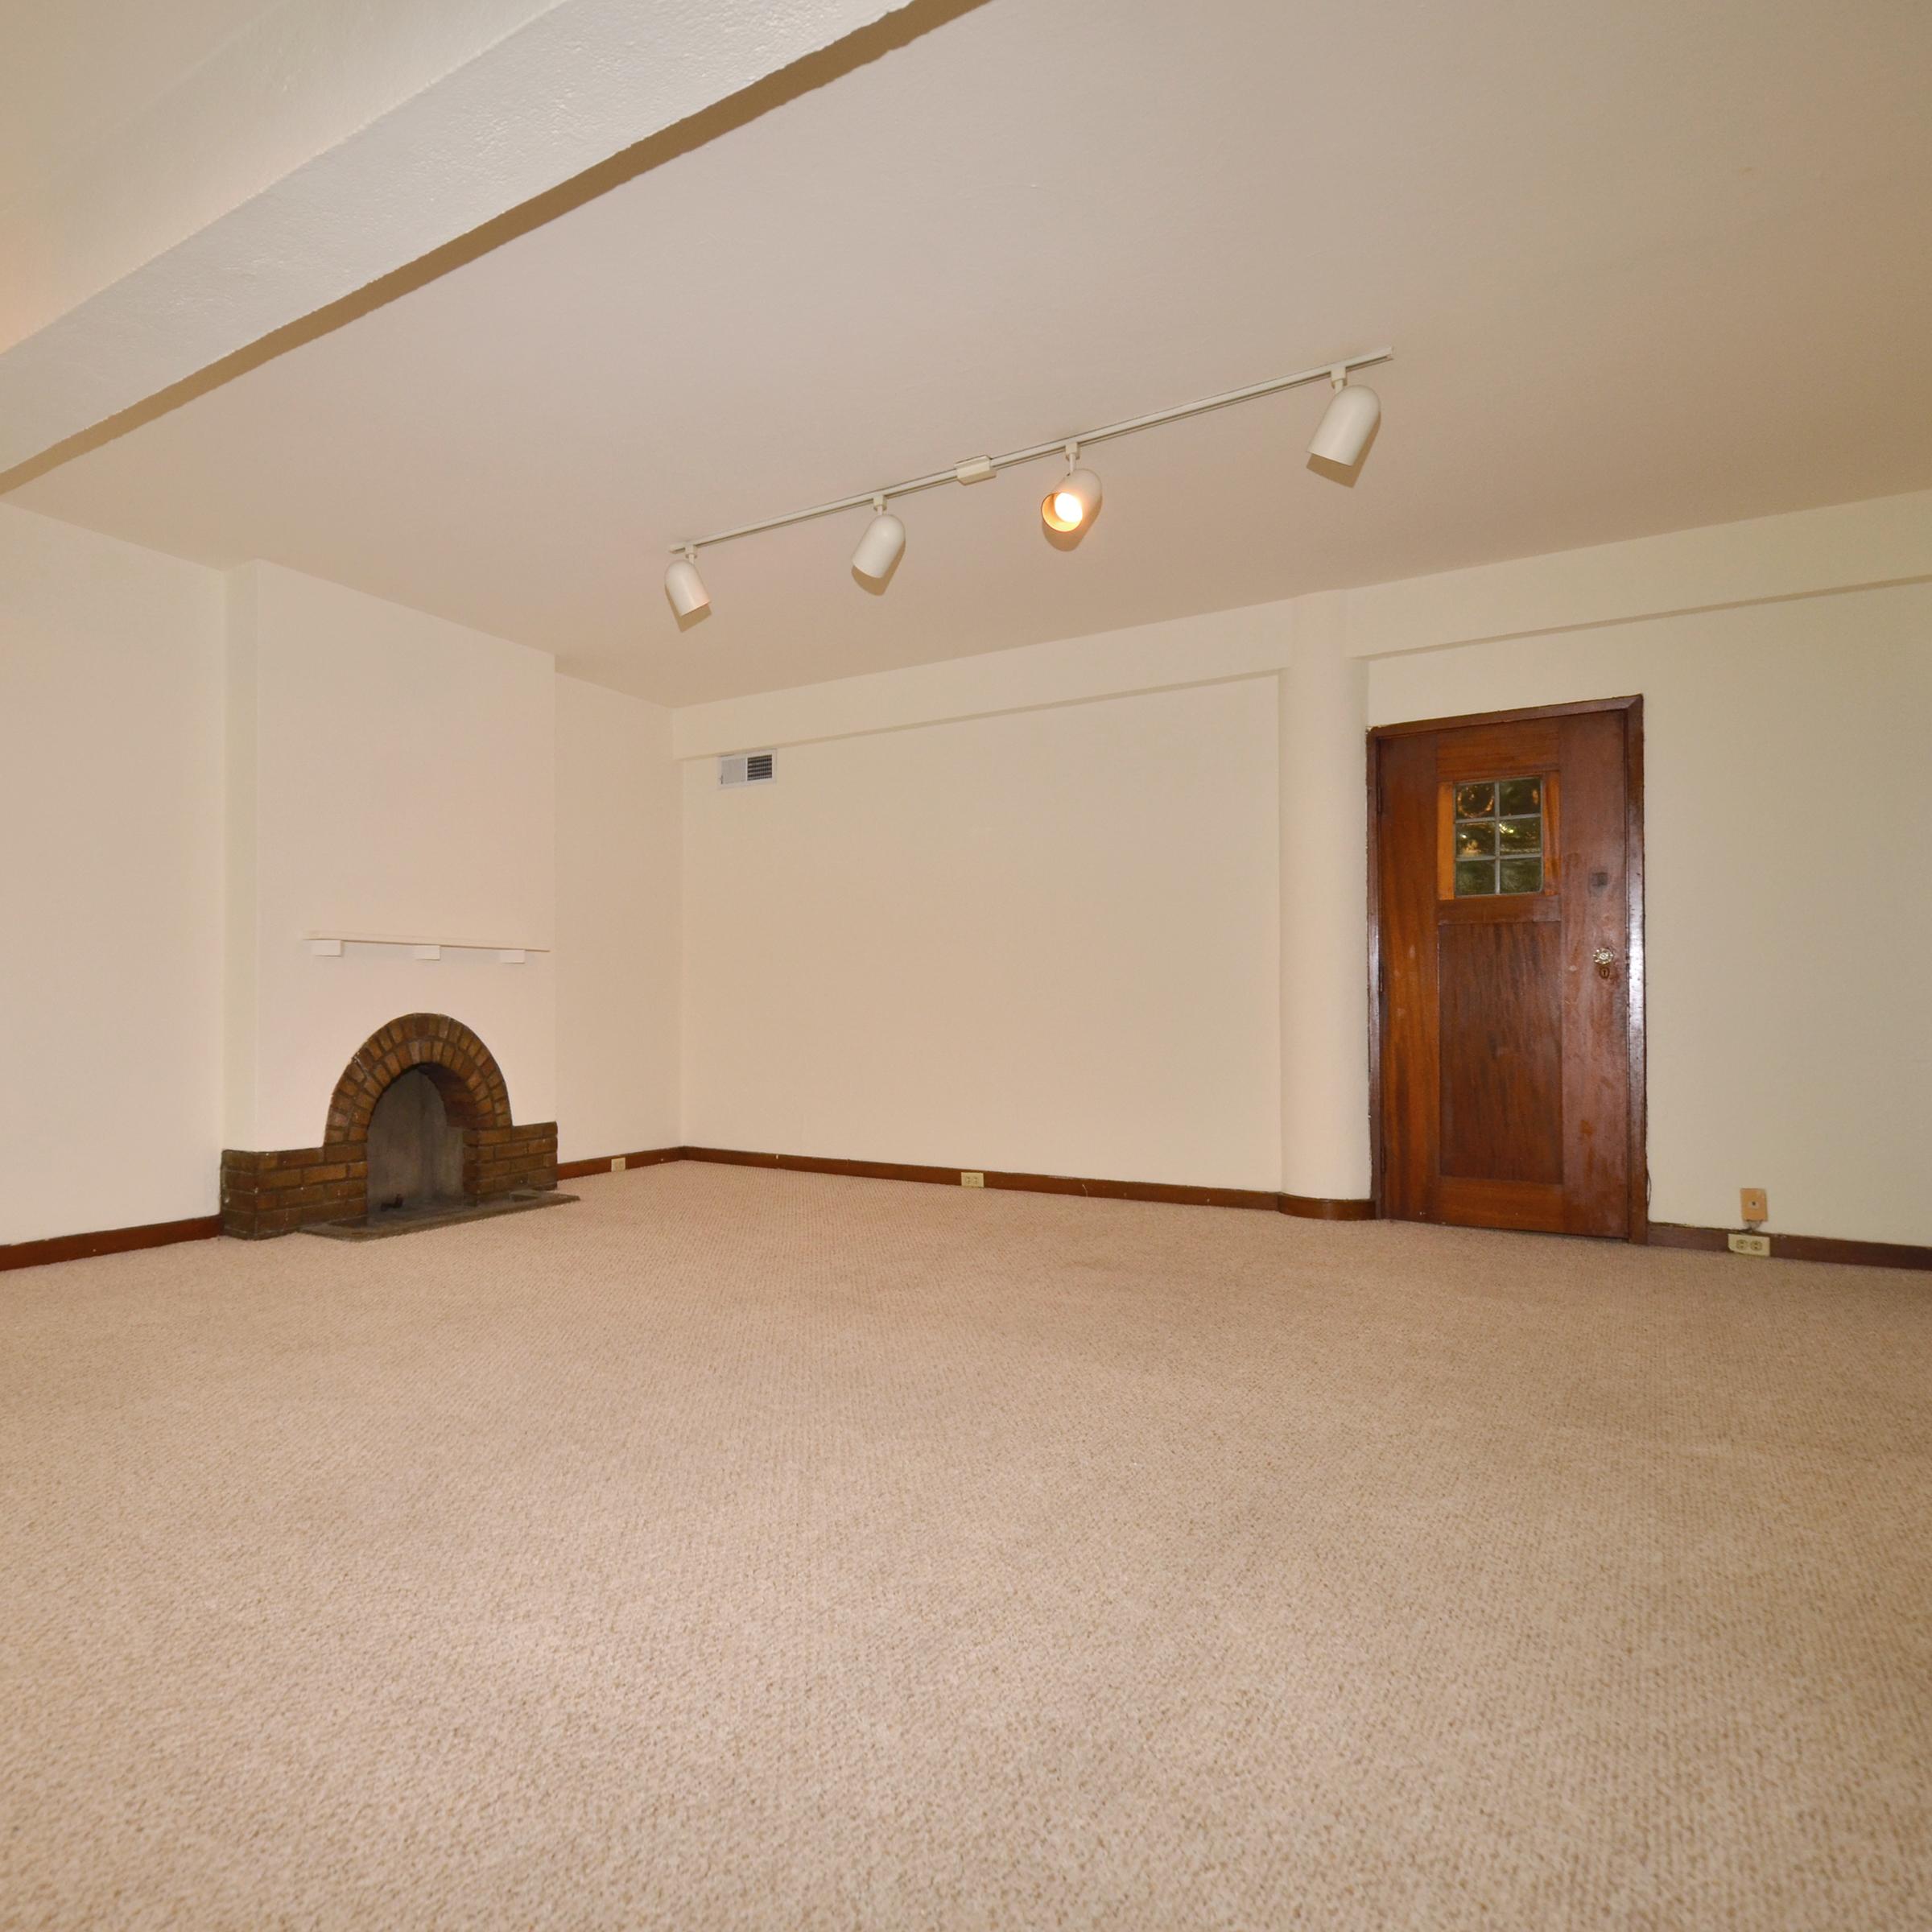 interior of 340 S. Highland Ave, Apt. 4A 2